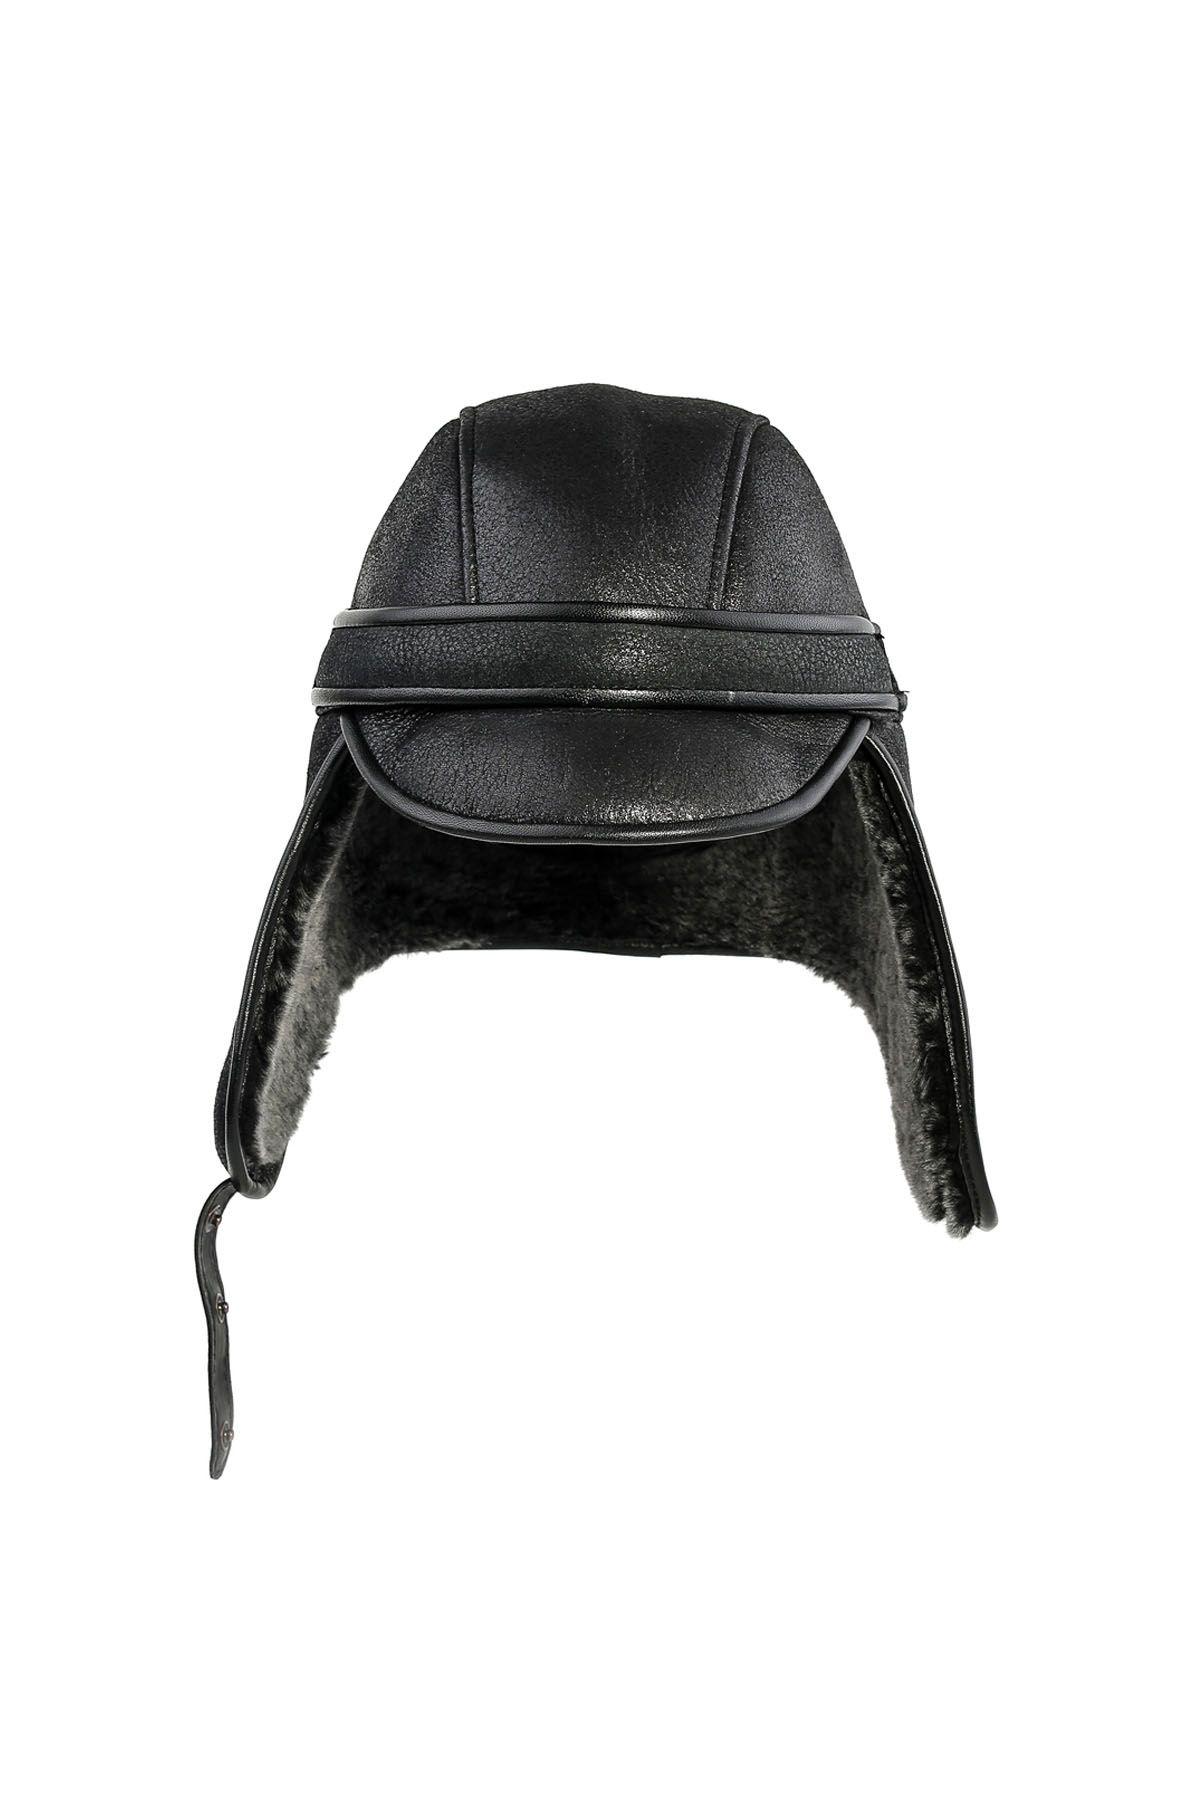 Pegia Hakiki Deri İçi Kürk Pilot Şapka 18AS13 Siyah